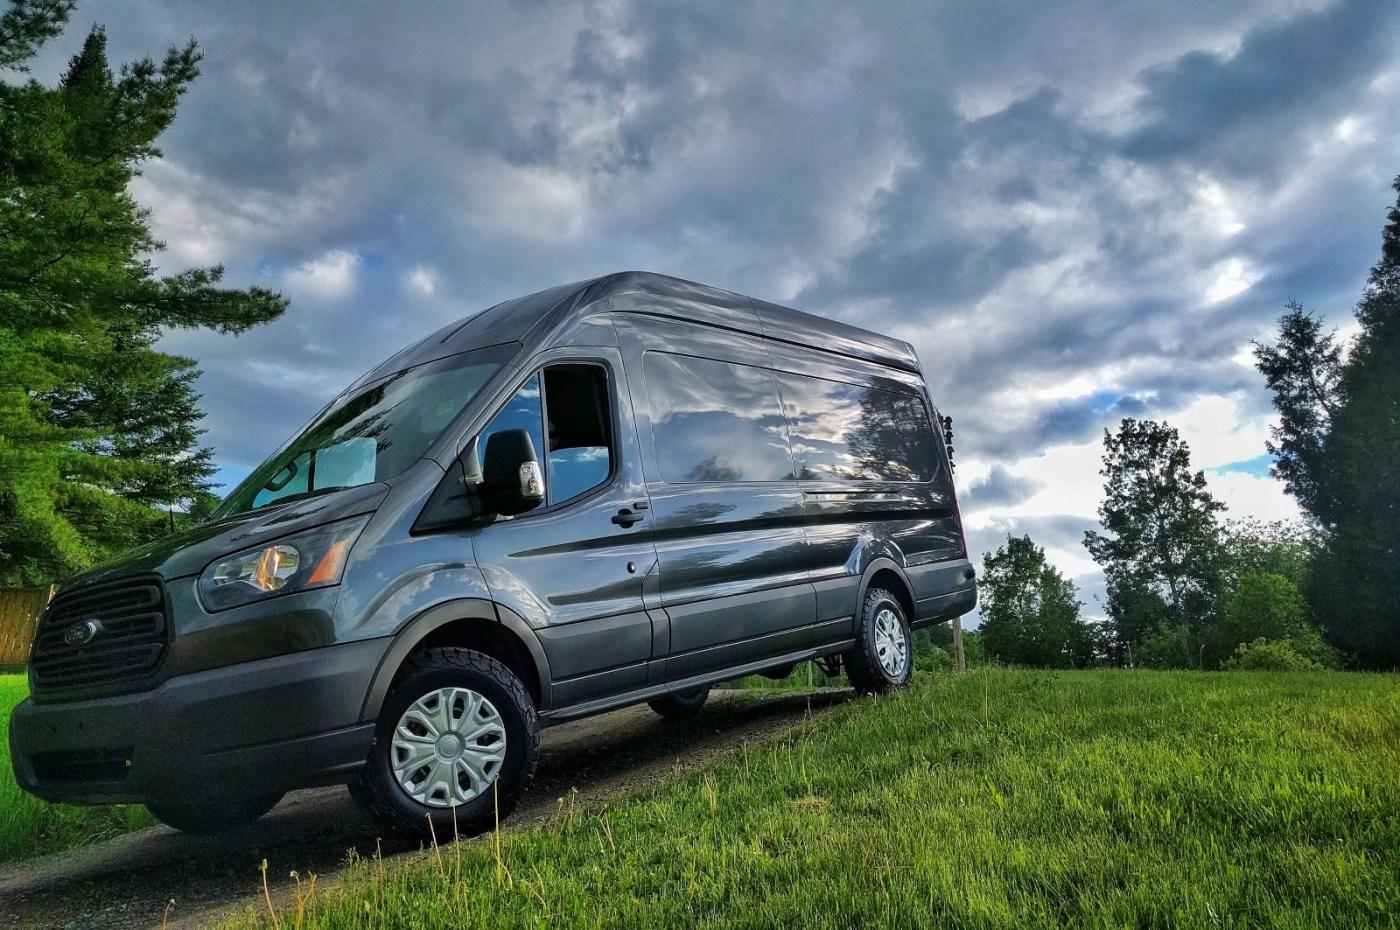 Ford Transit Larger Tires Upgrade